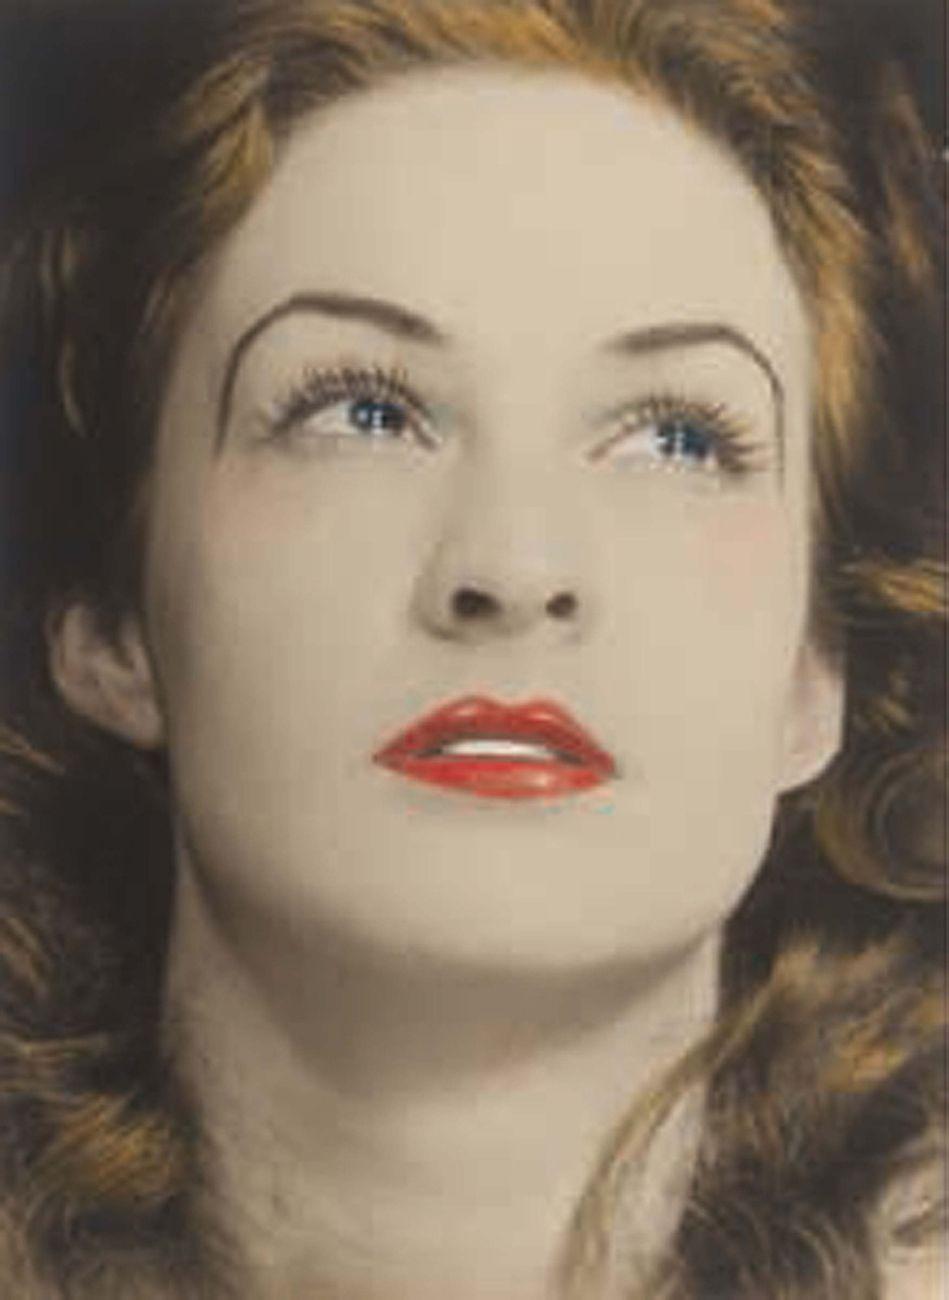 Man Ray, Portrait of a Tearful Woman, 1936